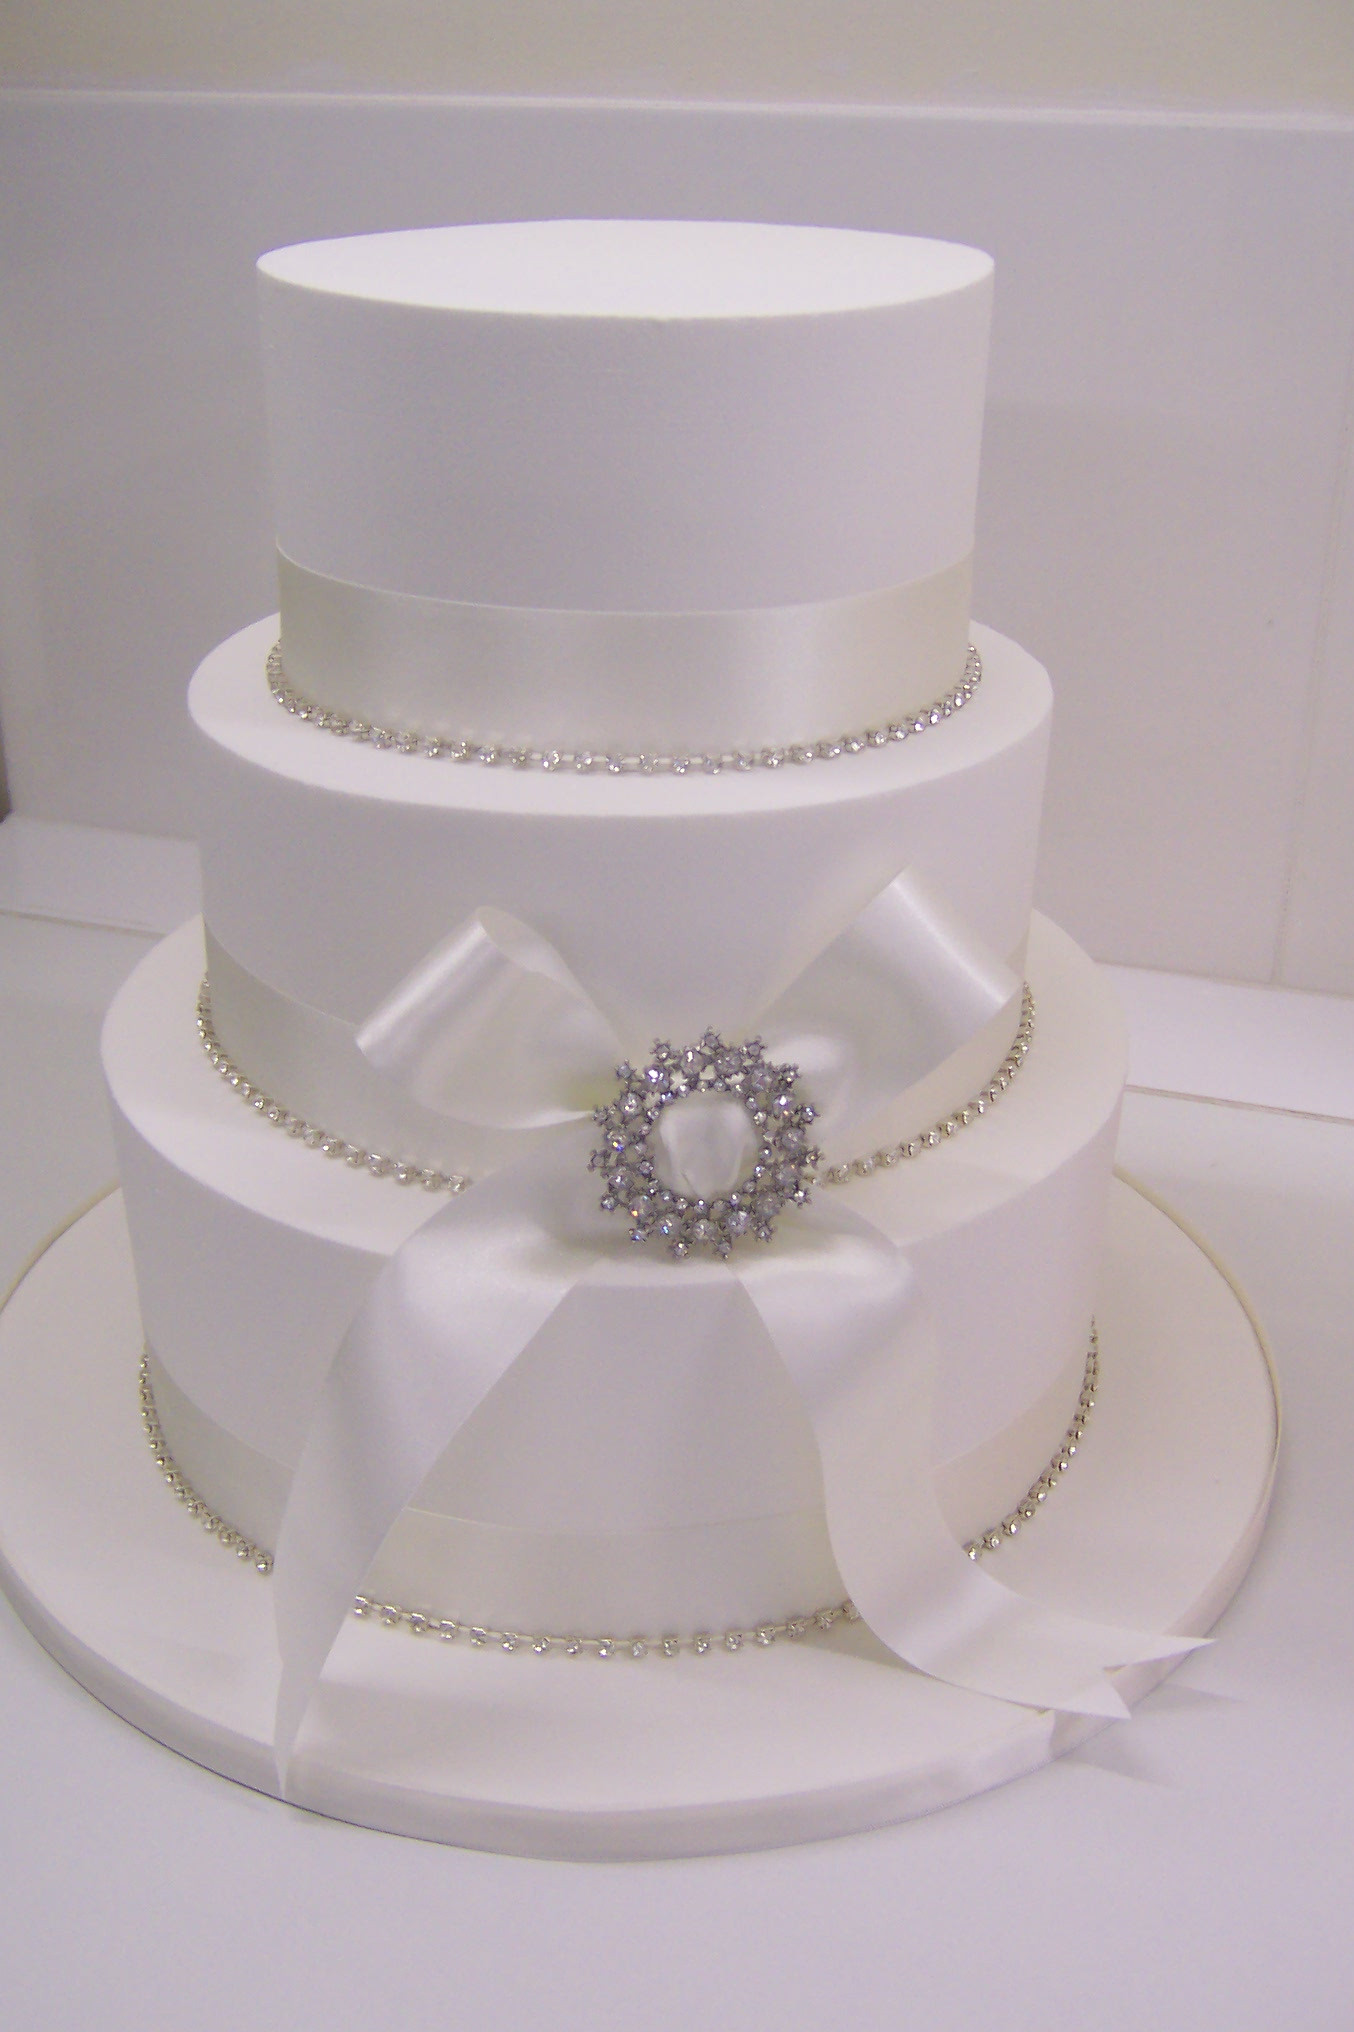 Iced Wedding Cakes  Royal Iced Wedding Cakes Inspirations